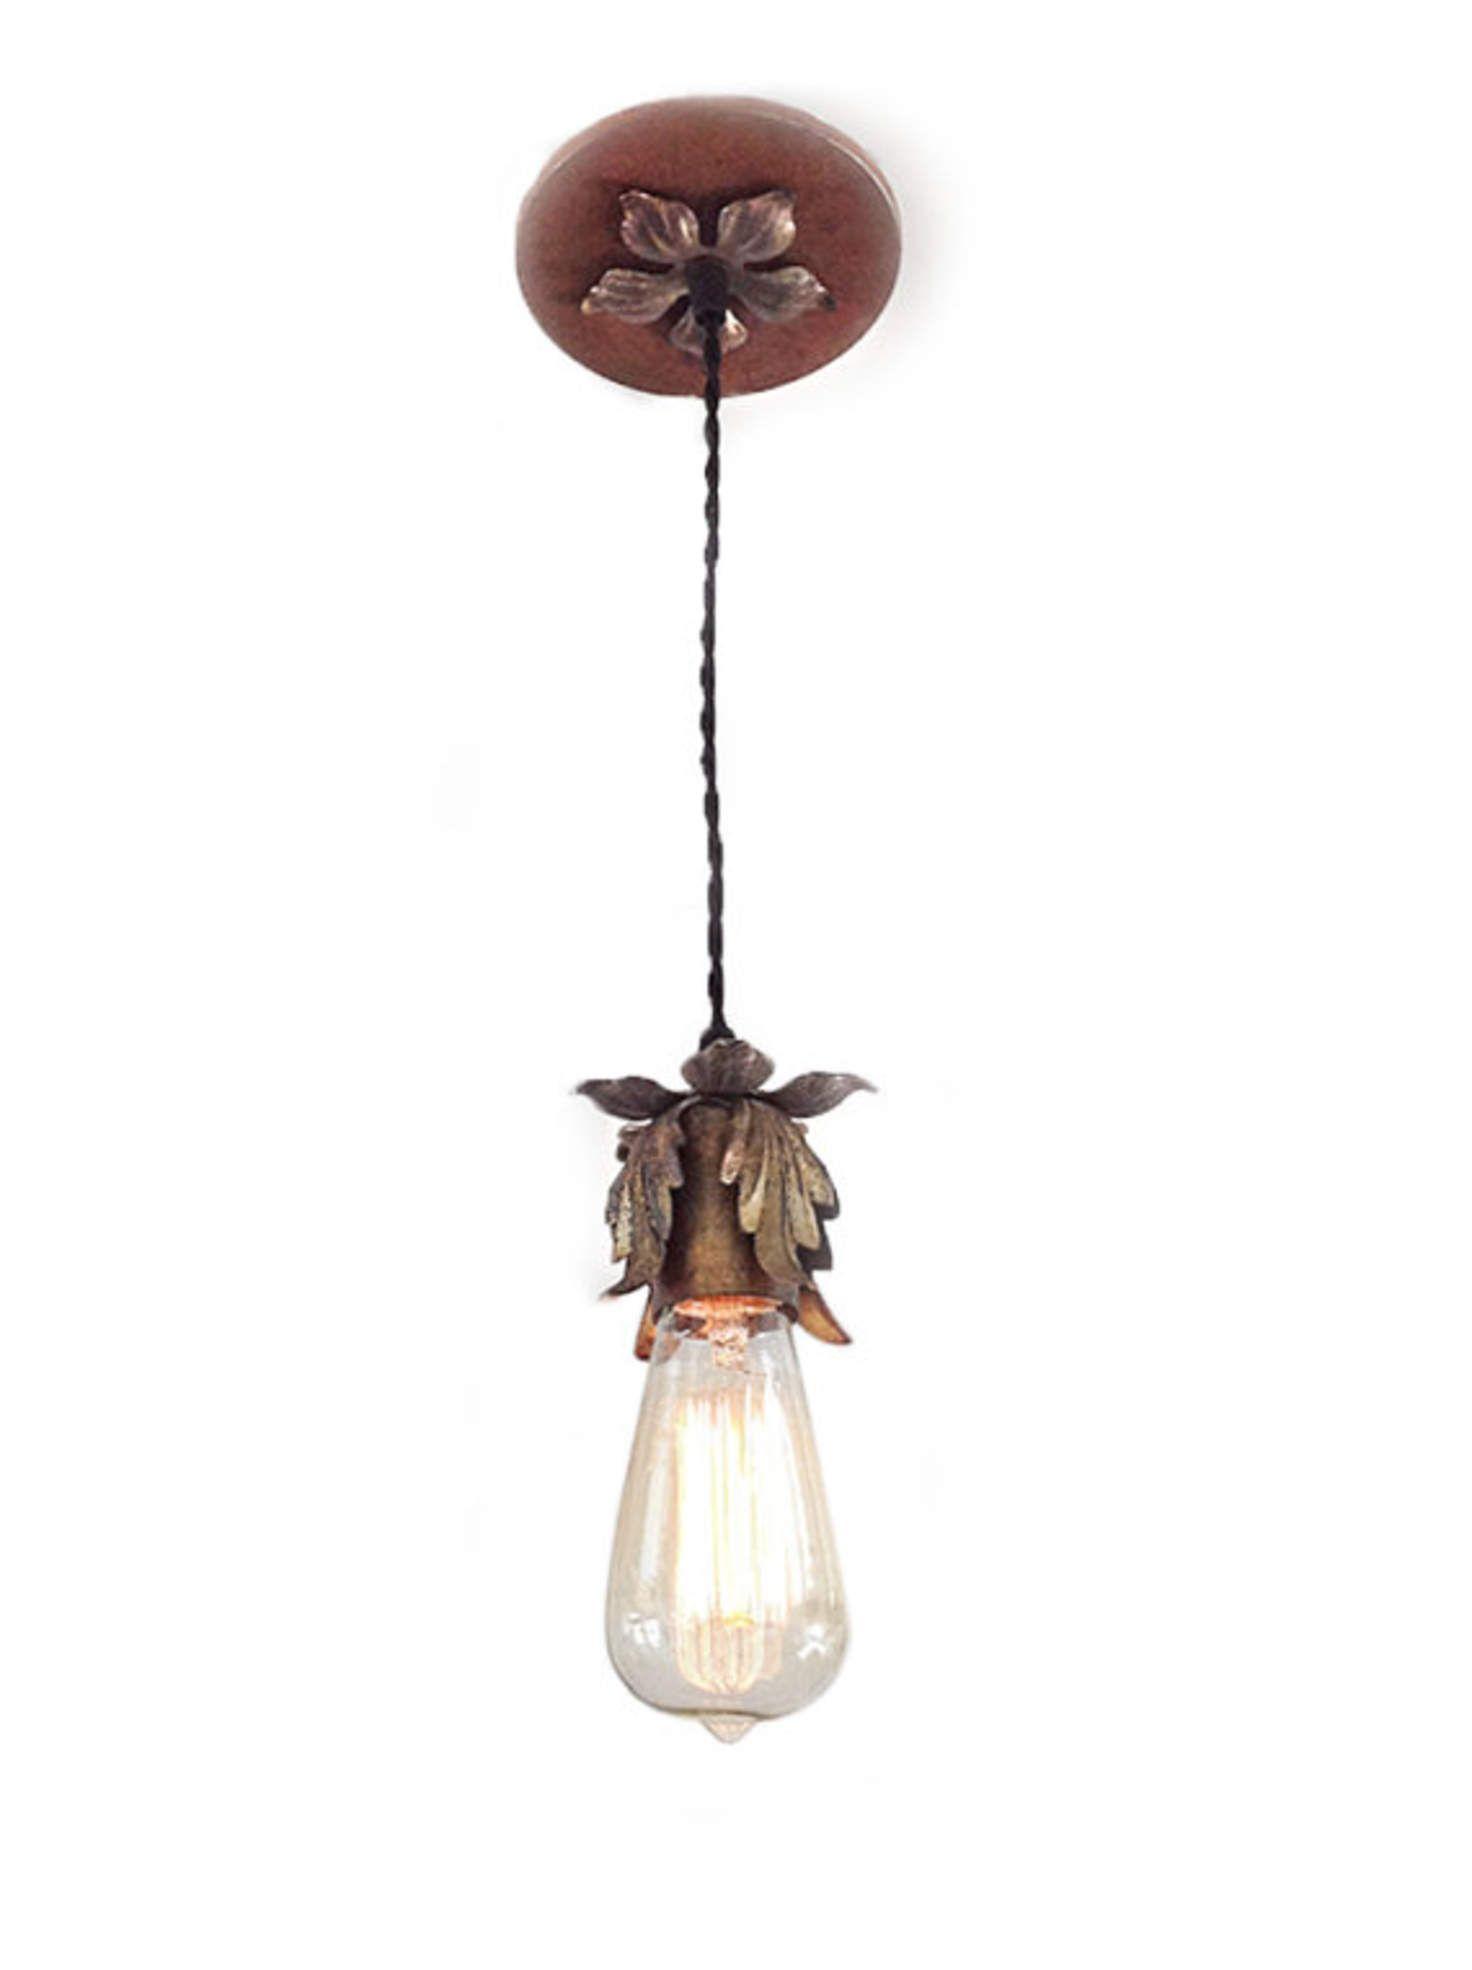 Hanging Pendant Light With Edison Bulb Shabby Chic Lighting Rustic Fixture Bathroom Kitchen